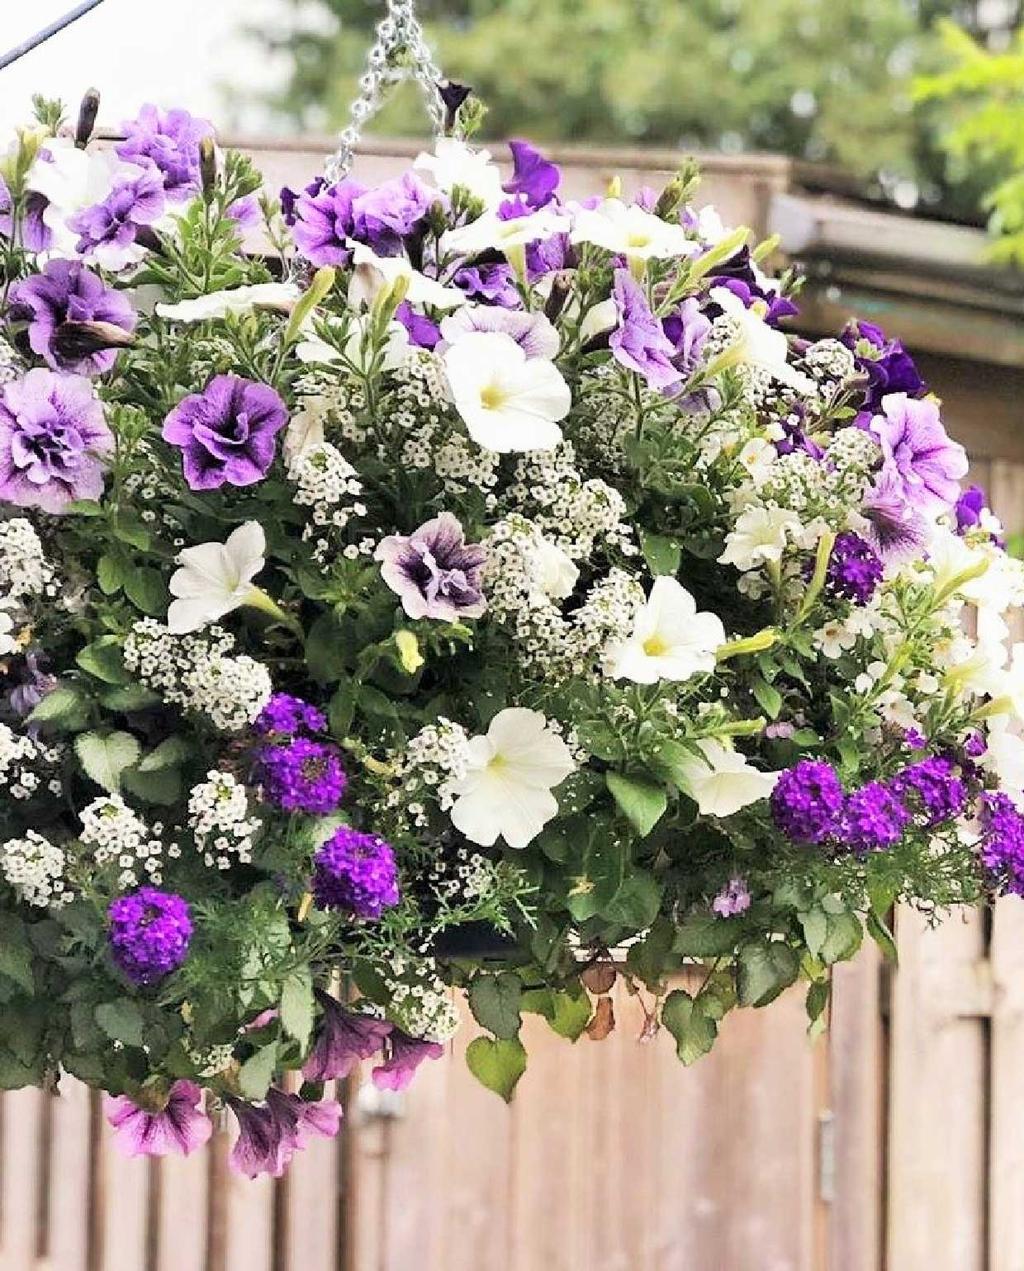 vtwonen blog kristel | hanging baskets paars en witte bloemen